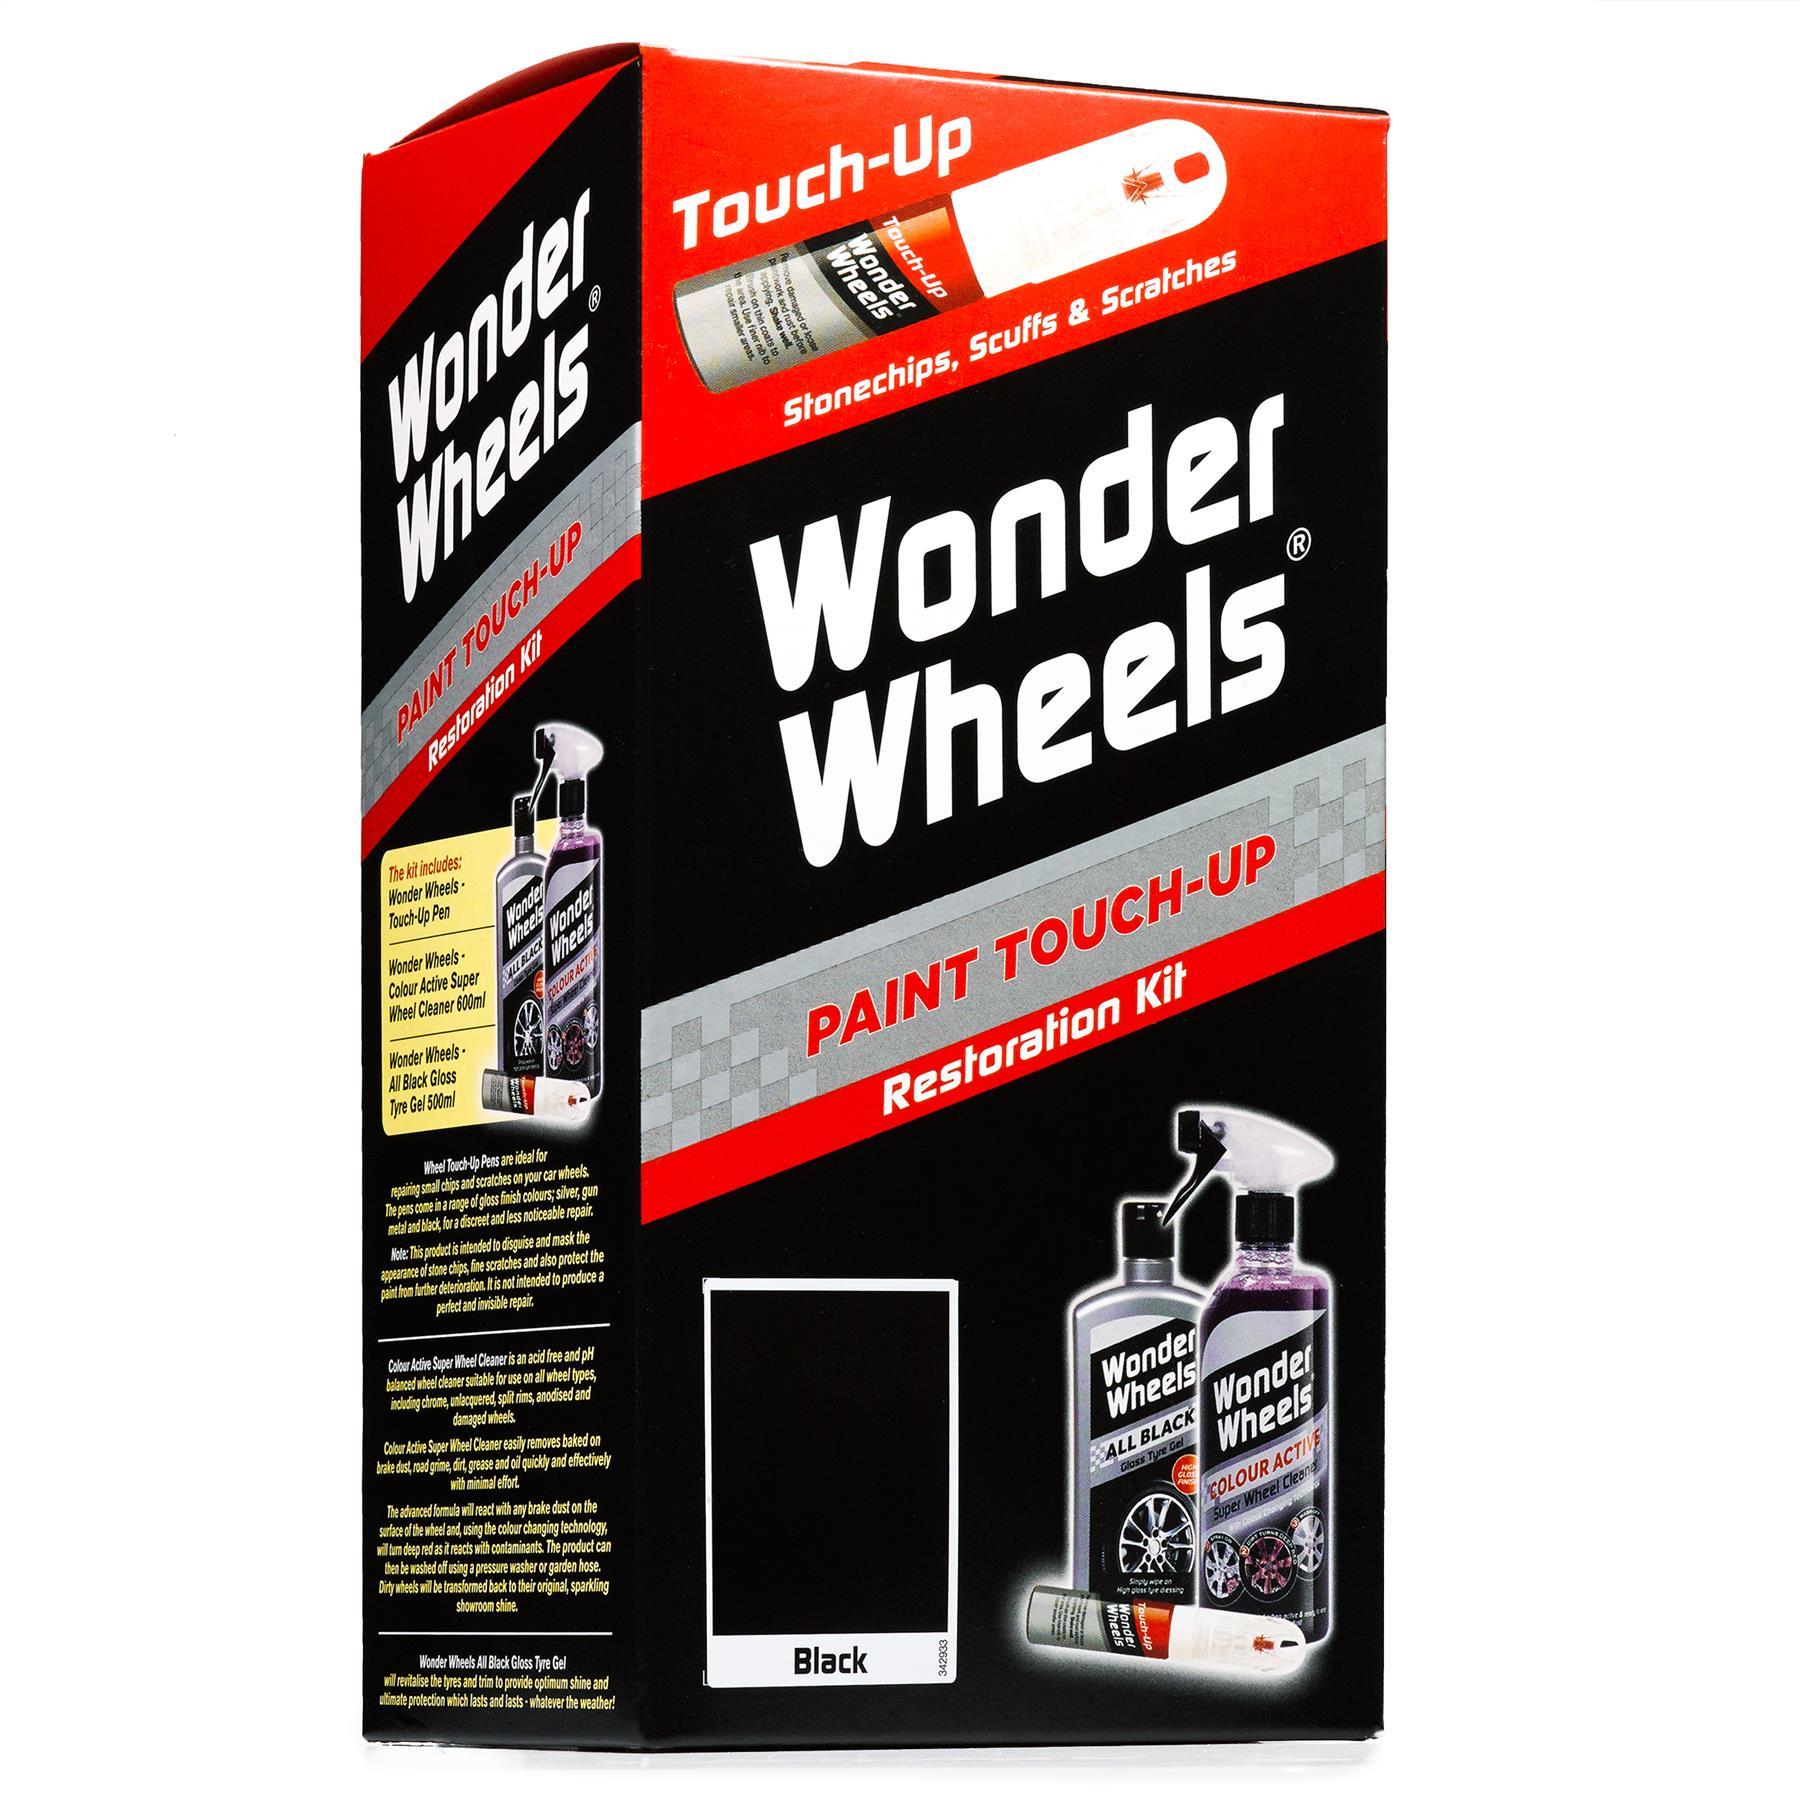 thumbnail 3 - Wonder-Wheels-Paint-Touch-Up-Restoration-Kit